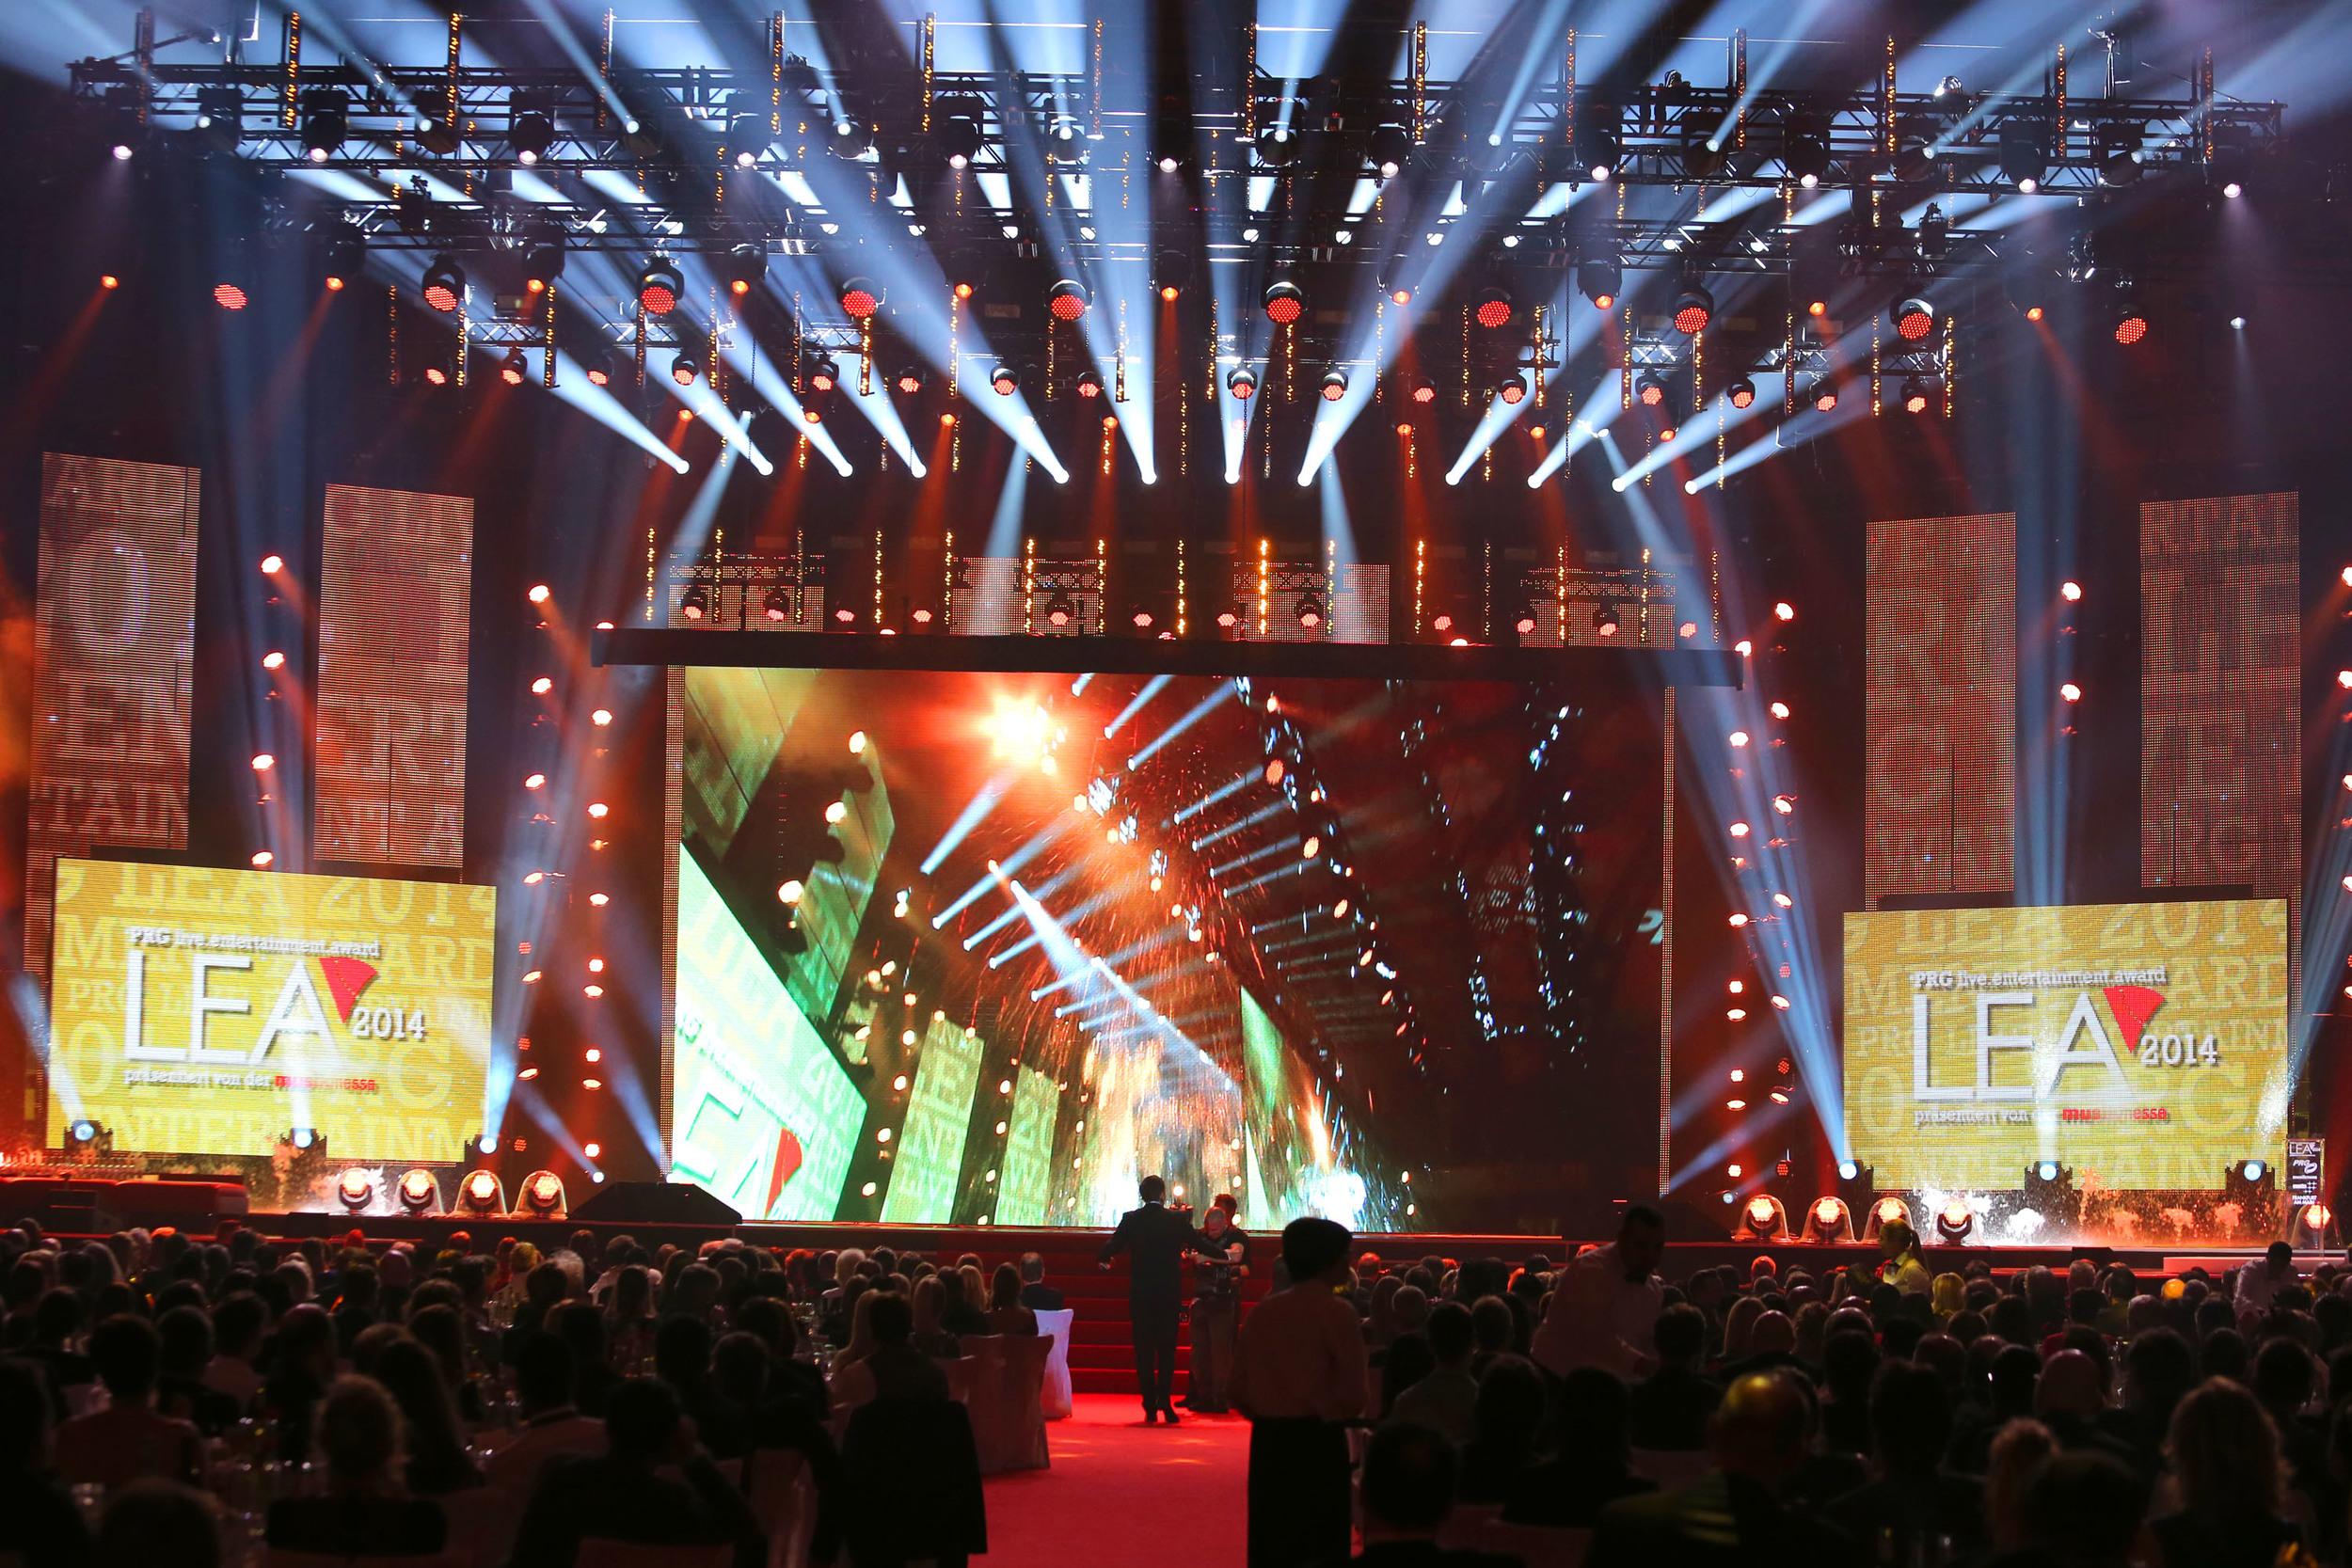 Live Entertainment Award 2014 - Frankfurt ( @ public address)